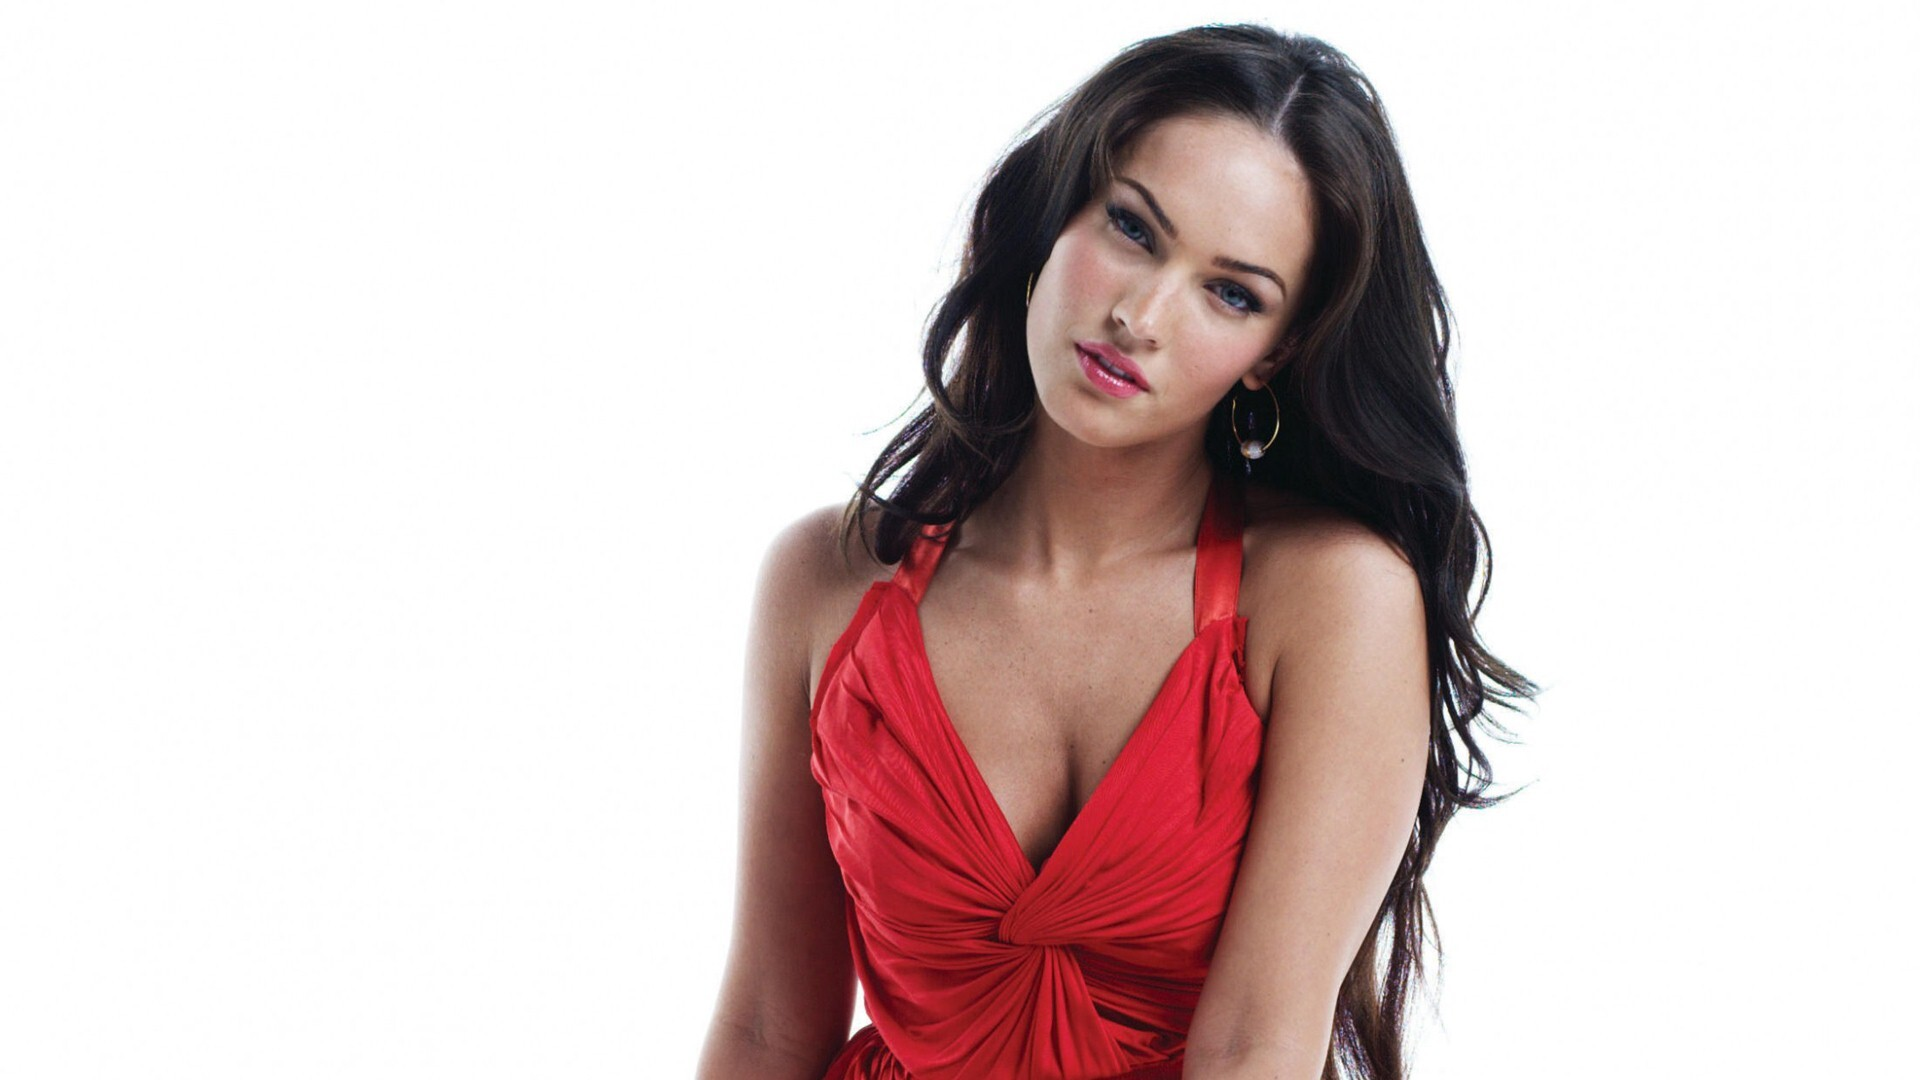 Megan Fox in Red Dress HD Wallpapers | HD Wallpapers